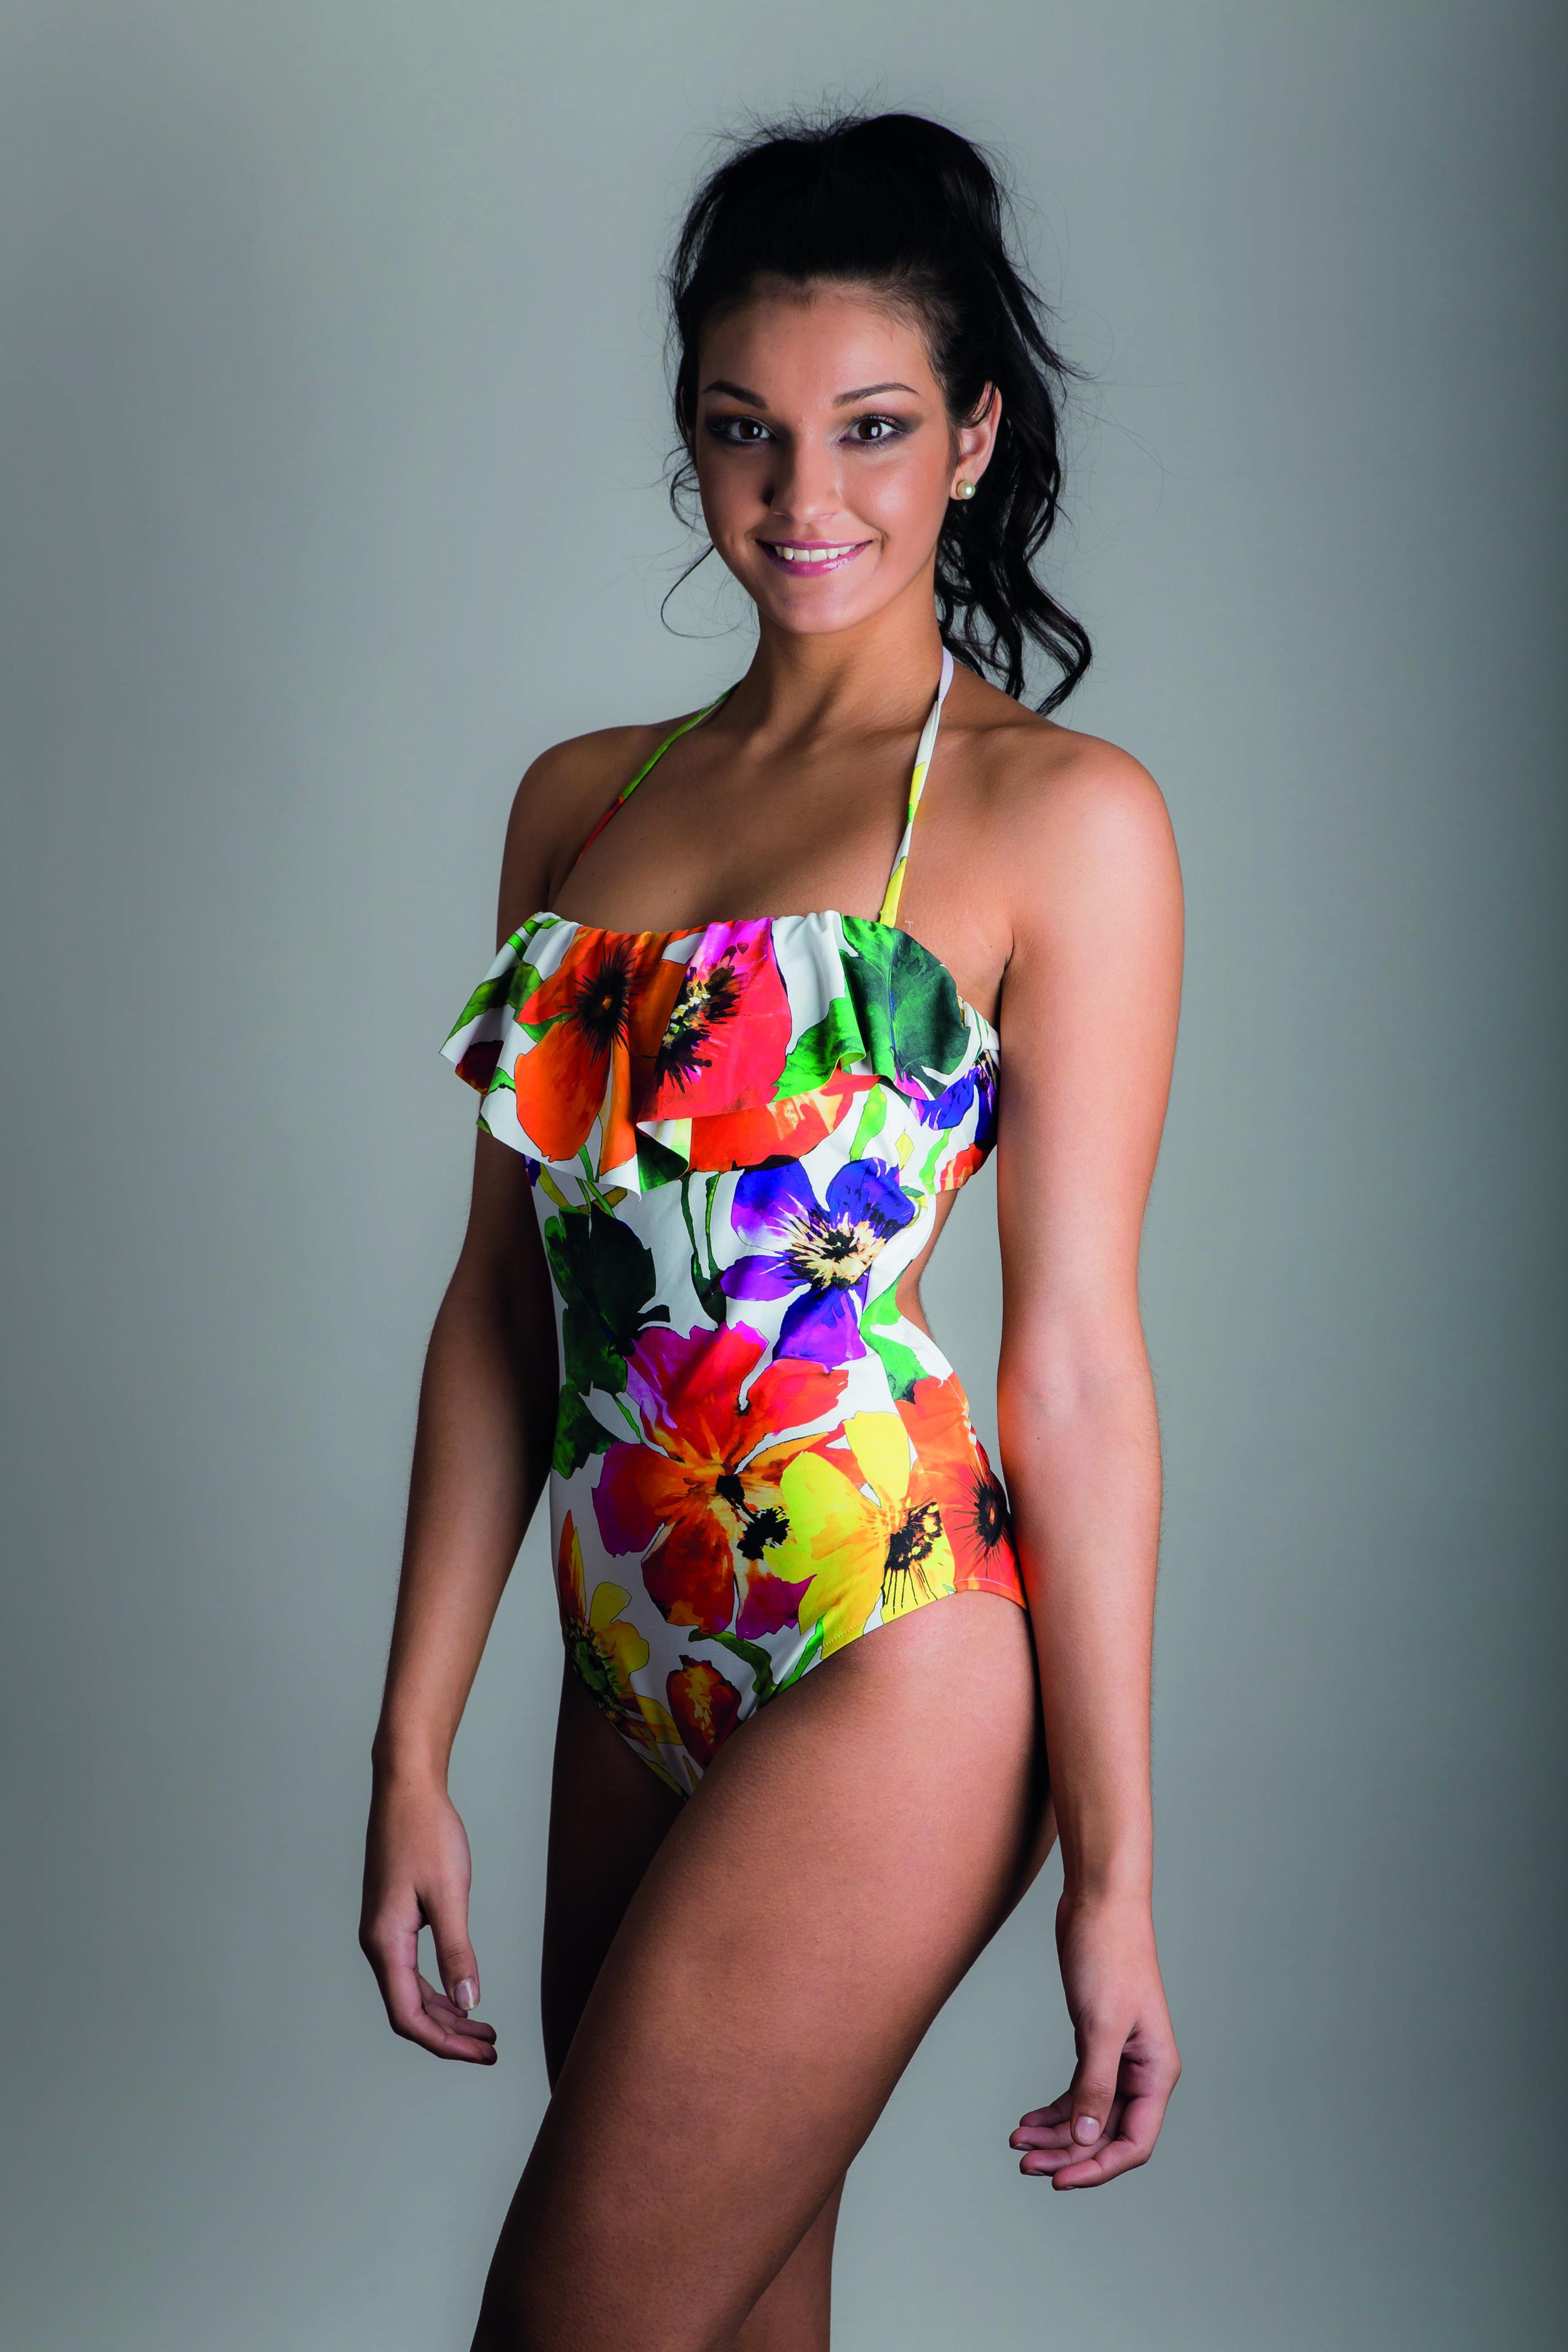 Danielle Sandhu wears Spring Summer 2014 Ralph Lauren swimwear for Robinsons of Bawtry